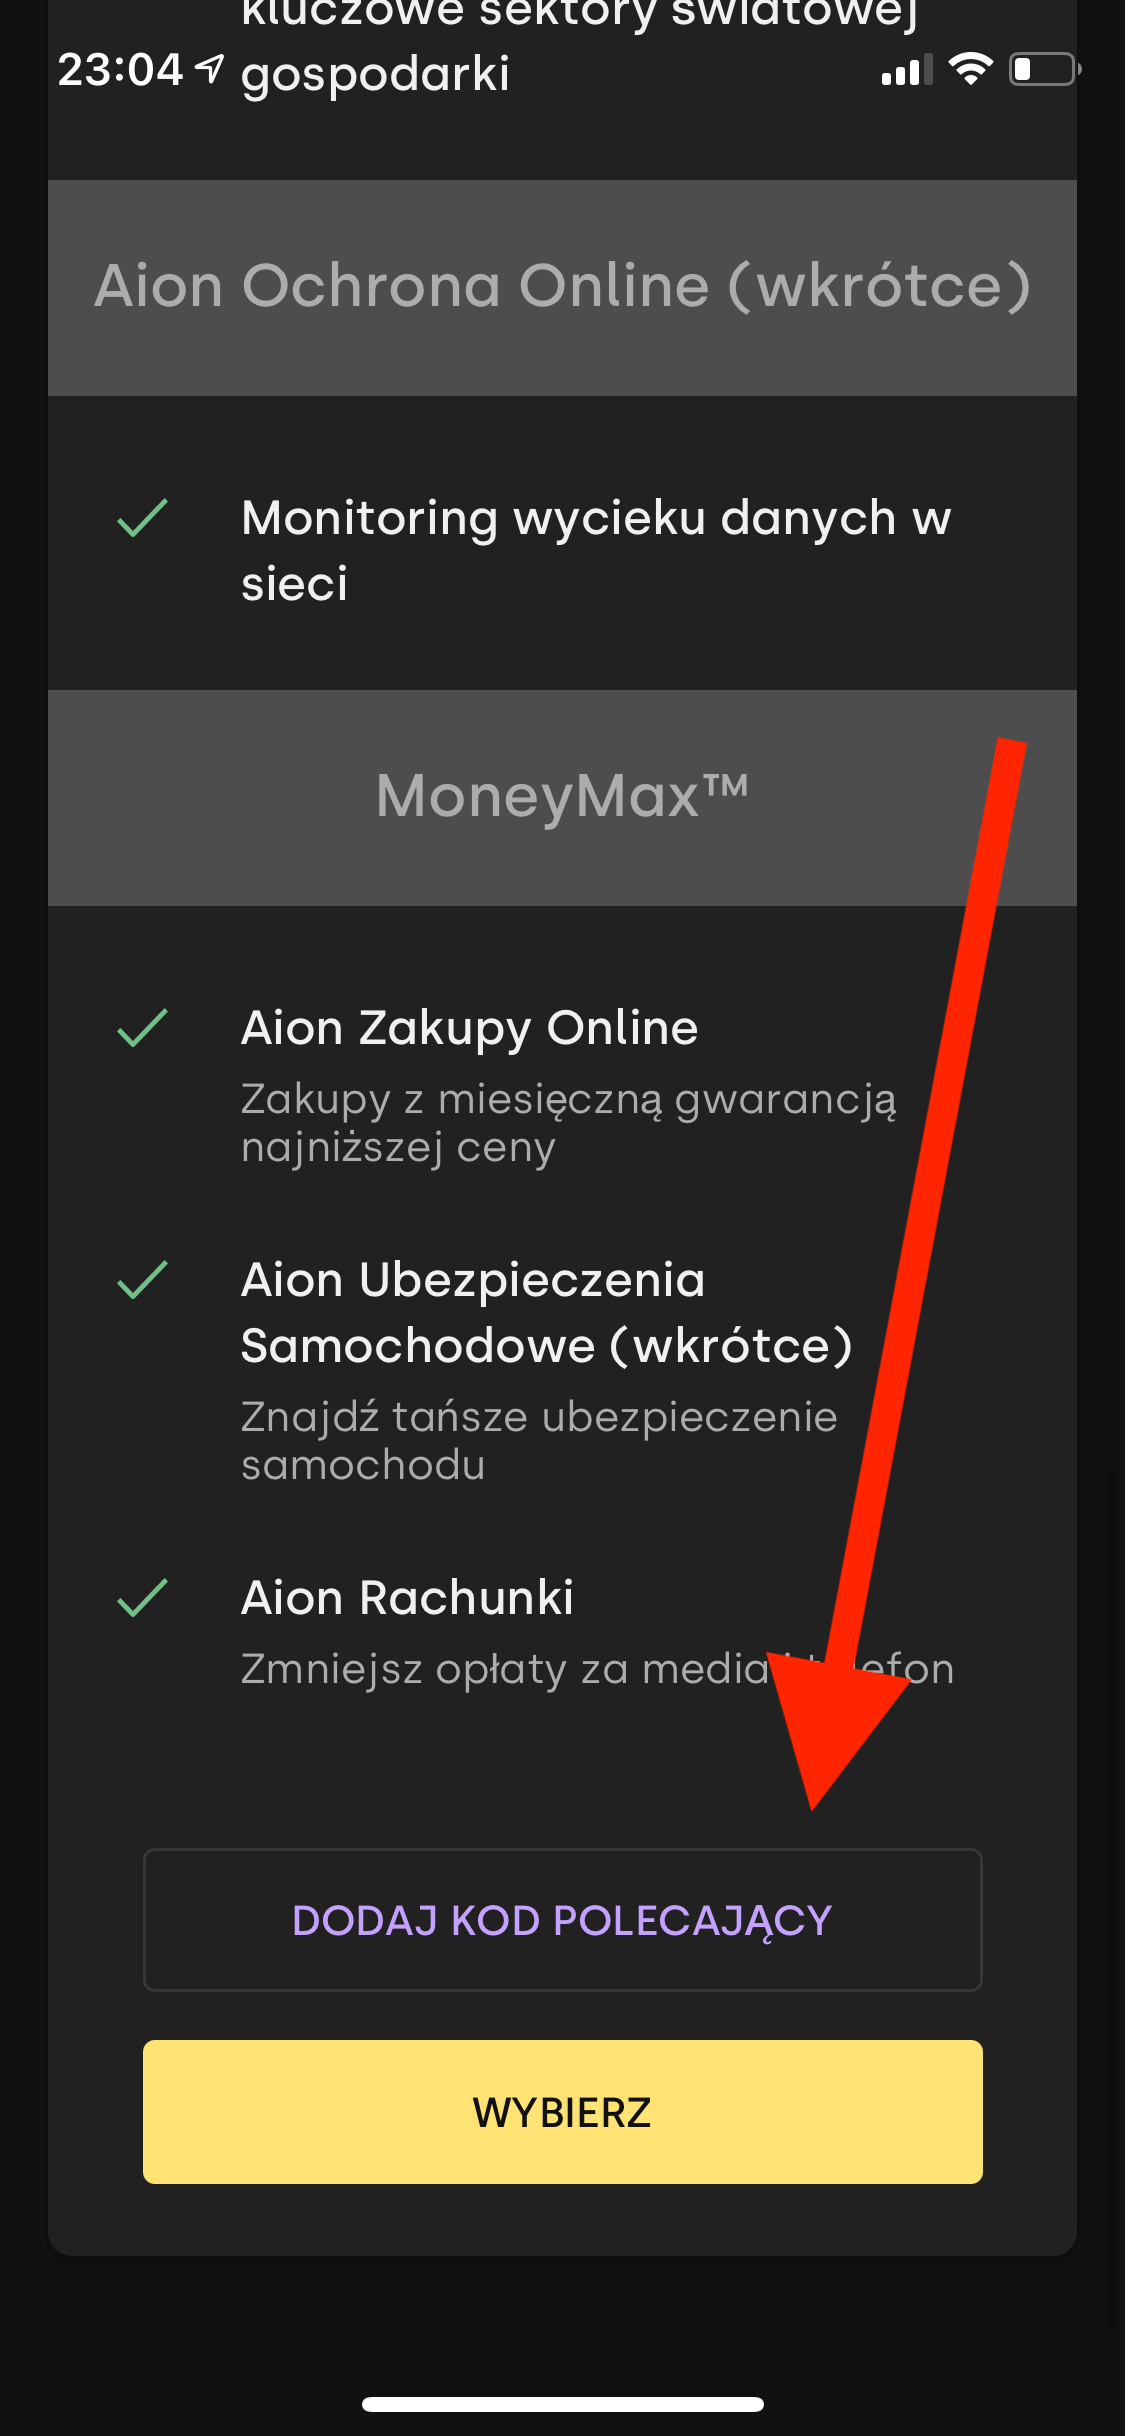 Aion Bank - kod polecający